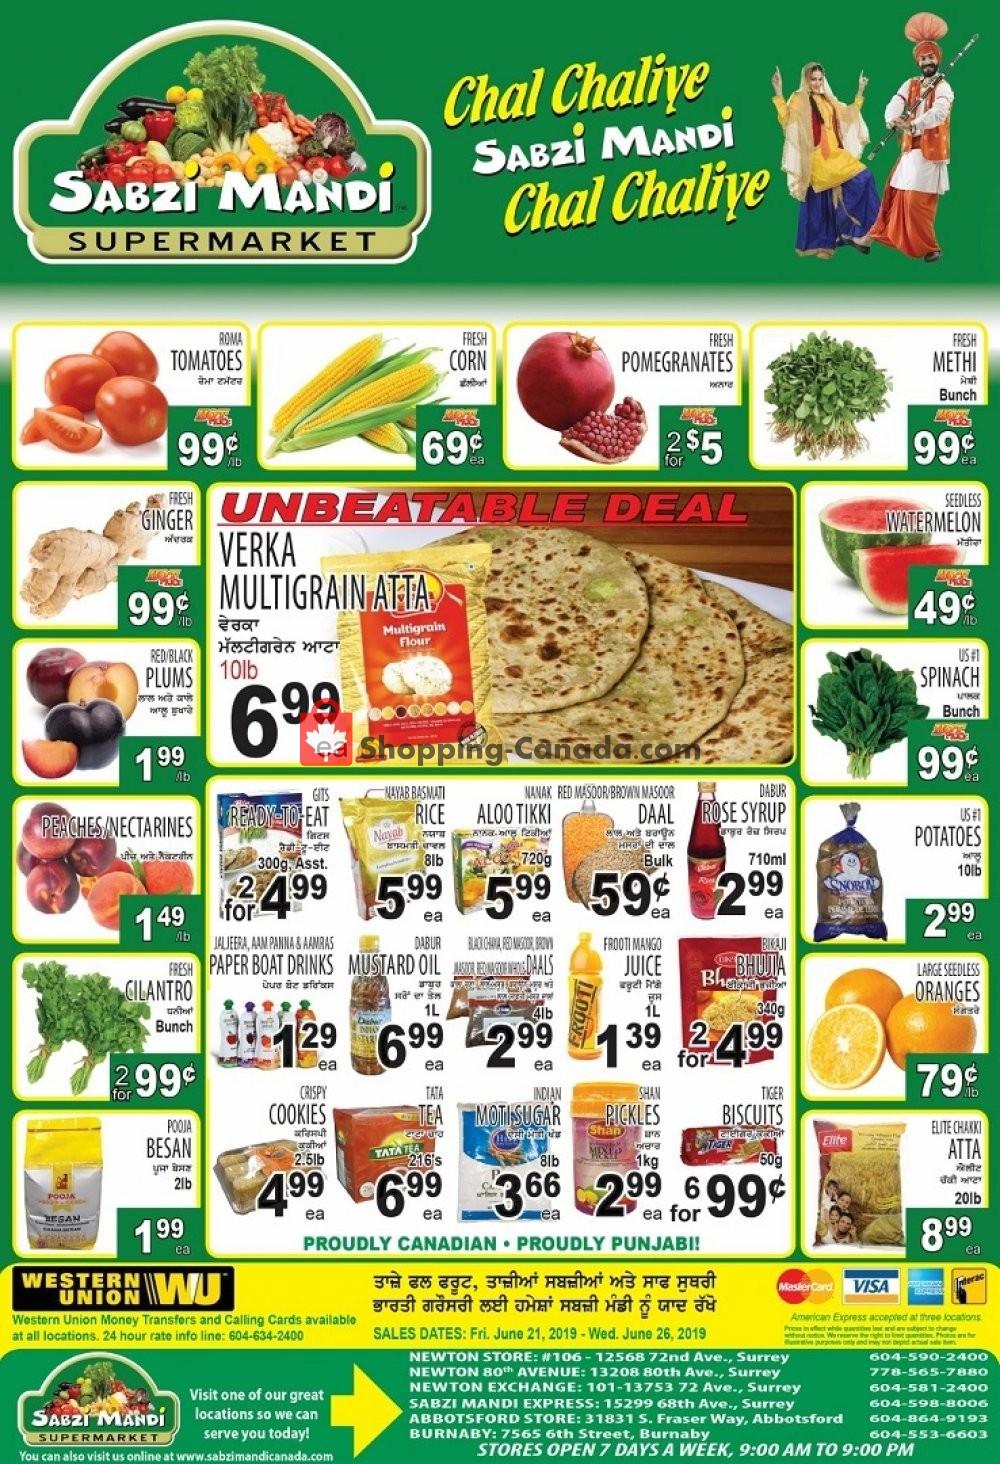 Flyer Sabzi Mandi Supermarket Canada - from Friday June 21, 2019 to Wednesday June 26, 2019